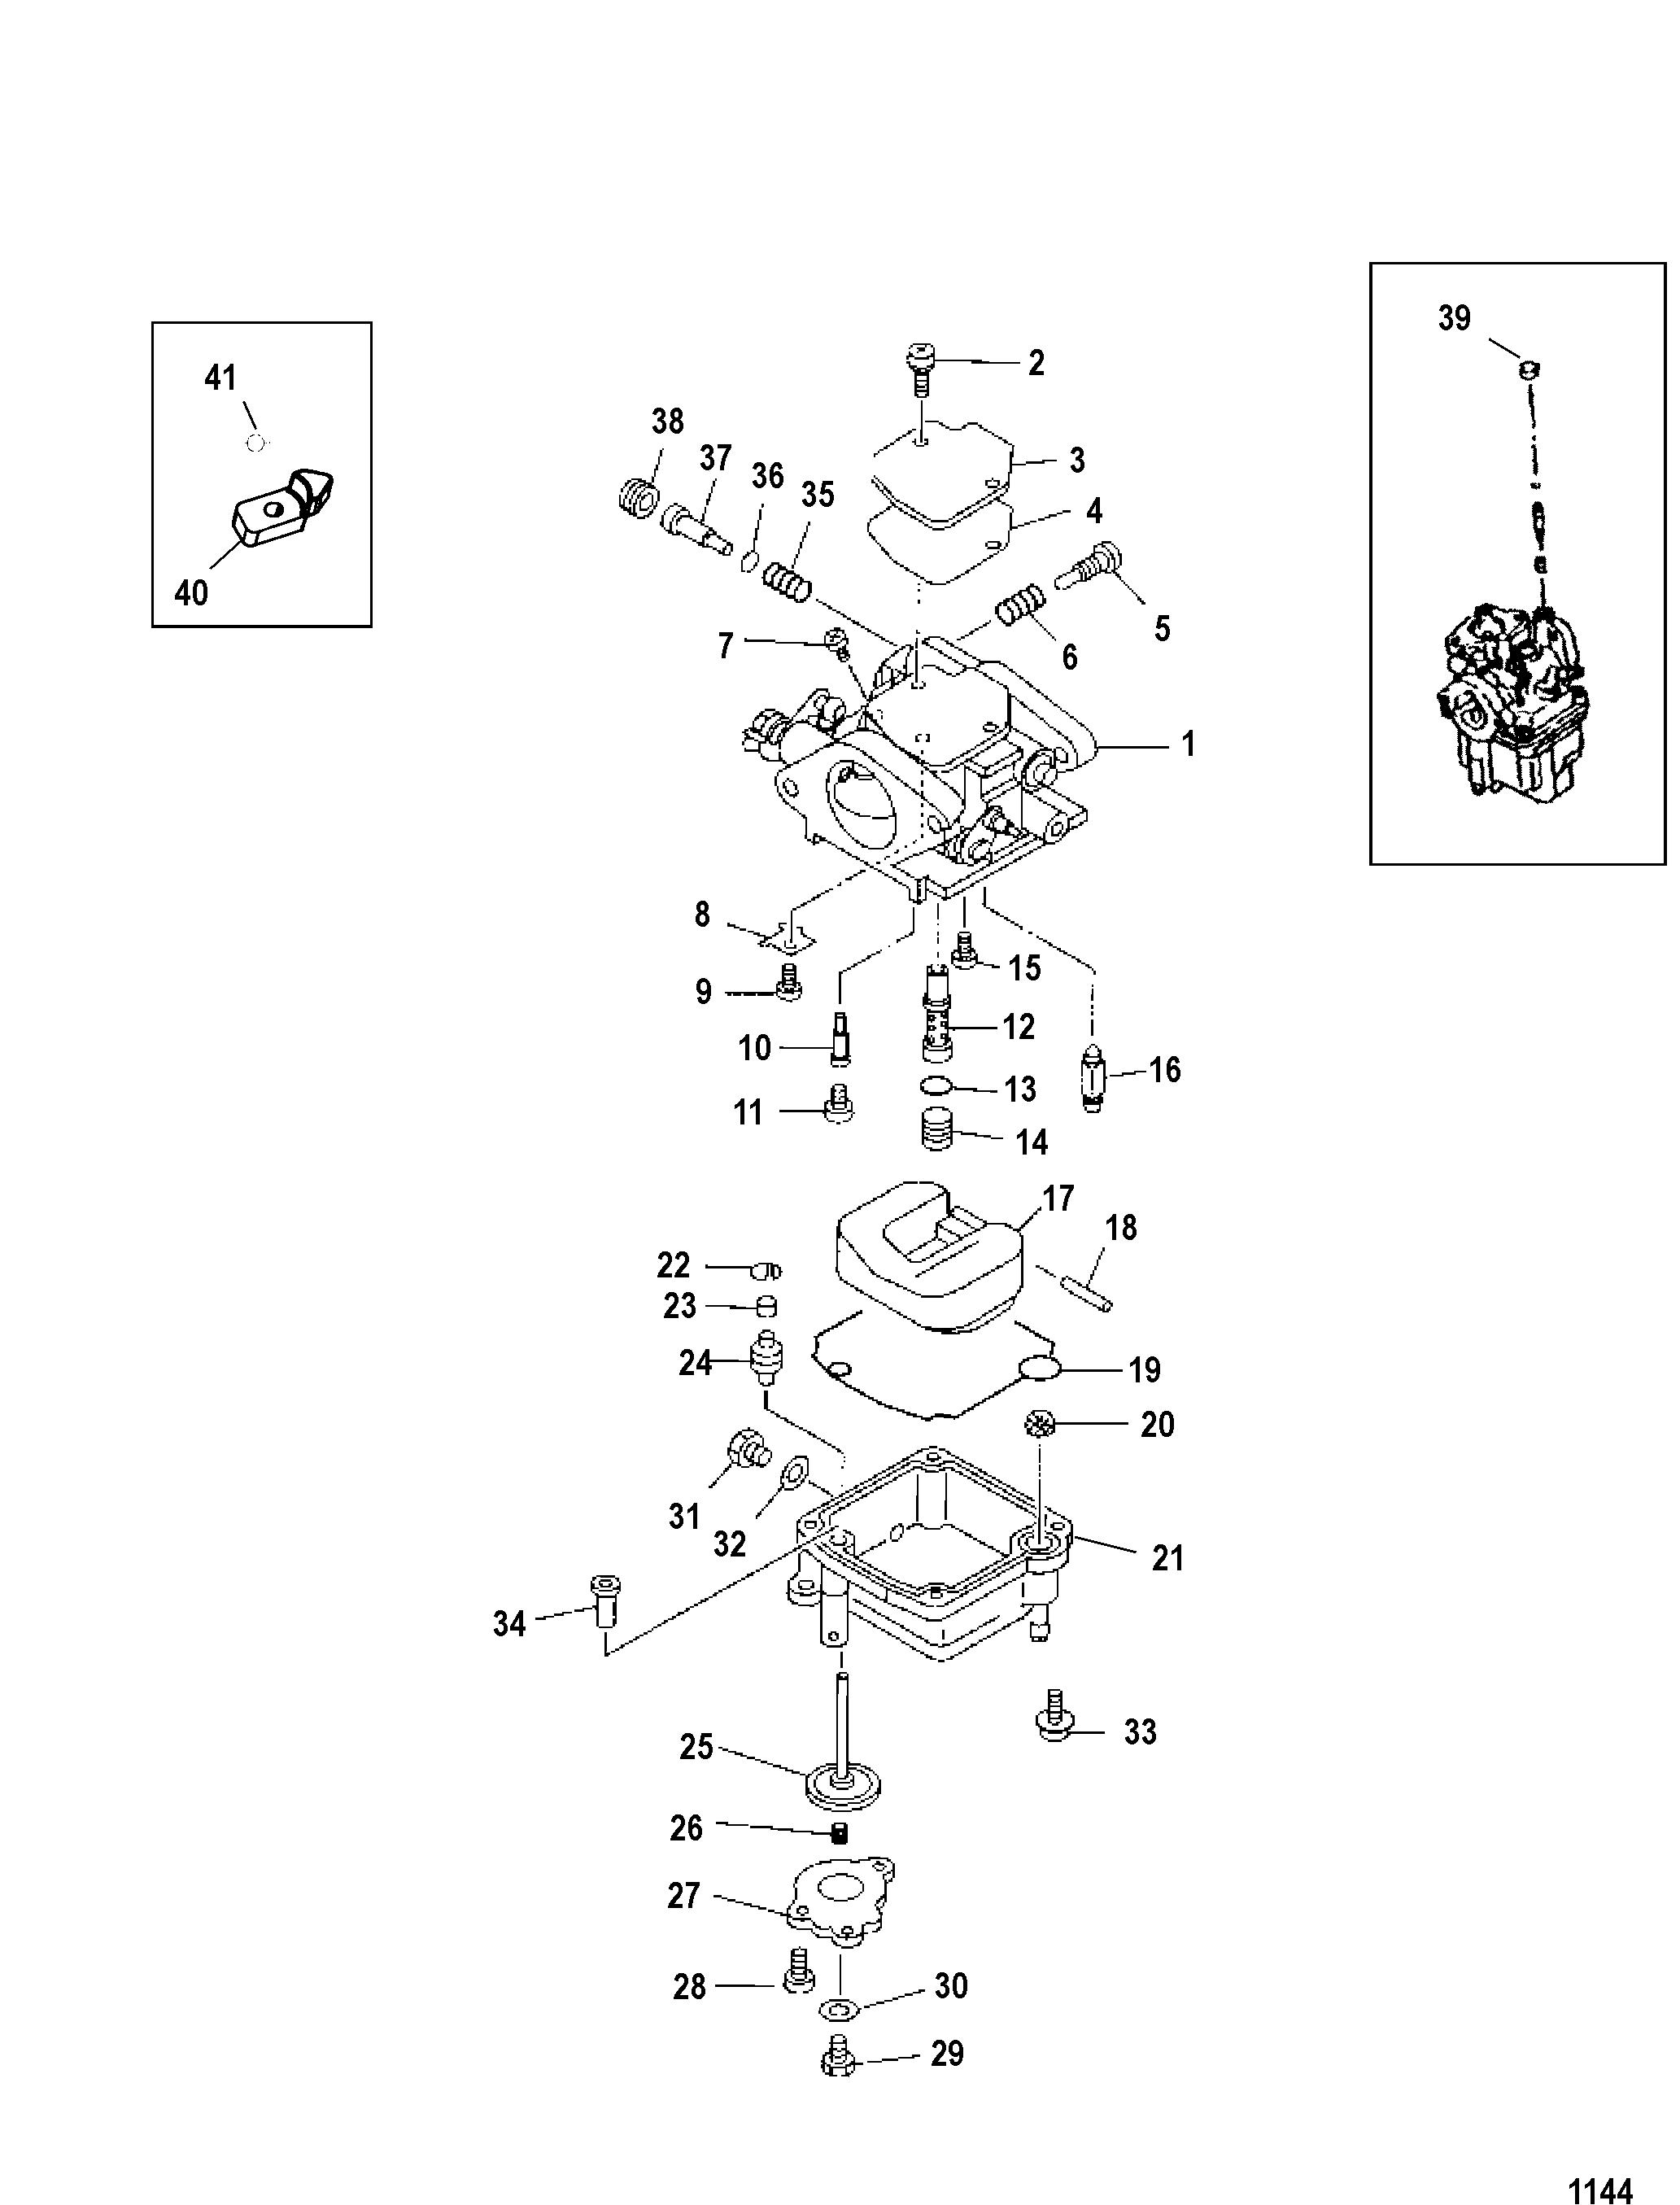 Pleasing Mercury Mariner 9 9 4 Stroke 323 Cc 0P075166 Thru 0P400999 Wiring 101 Capemaxxcnl